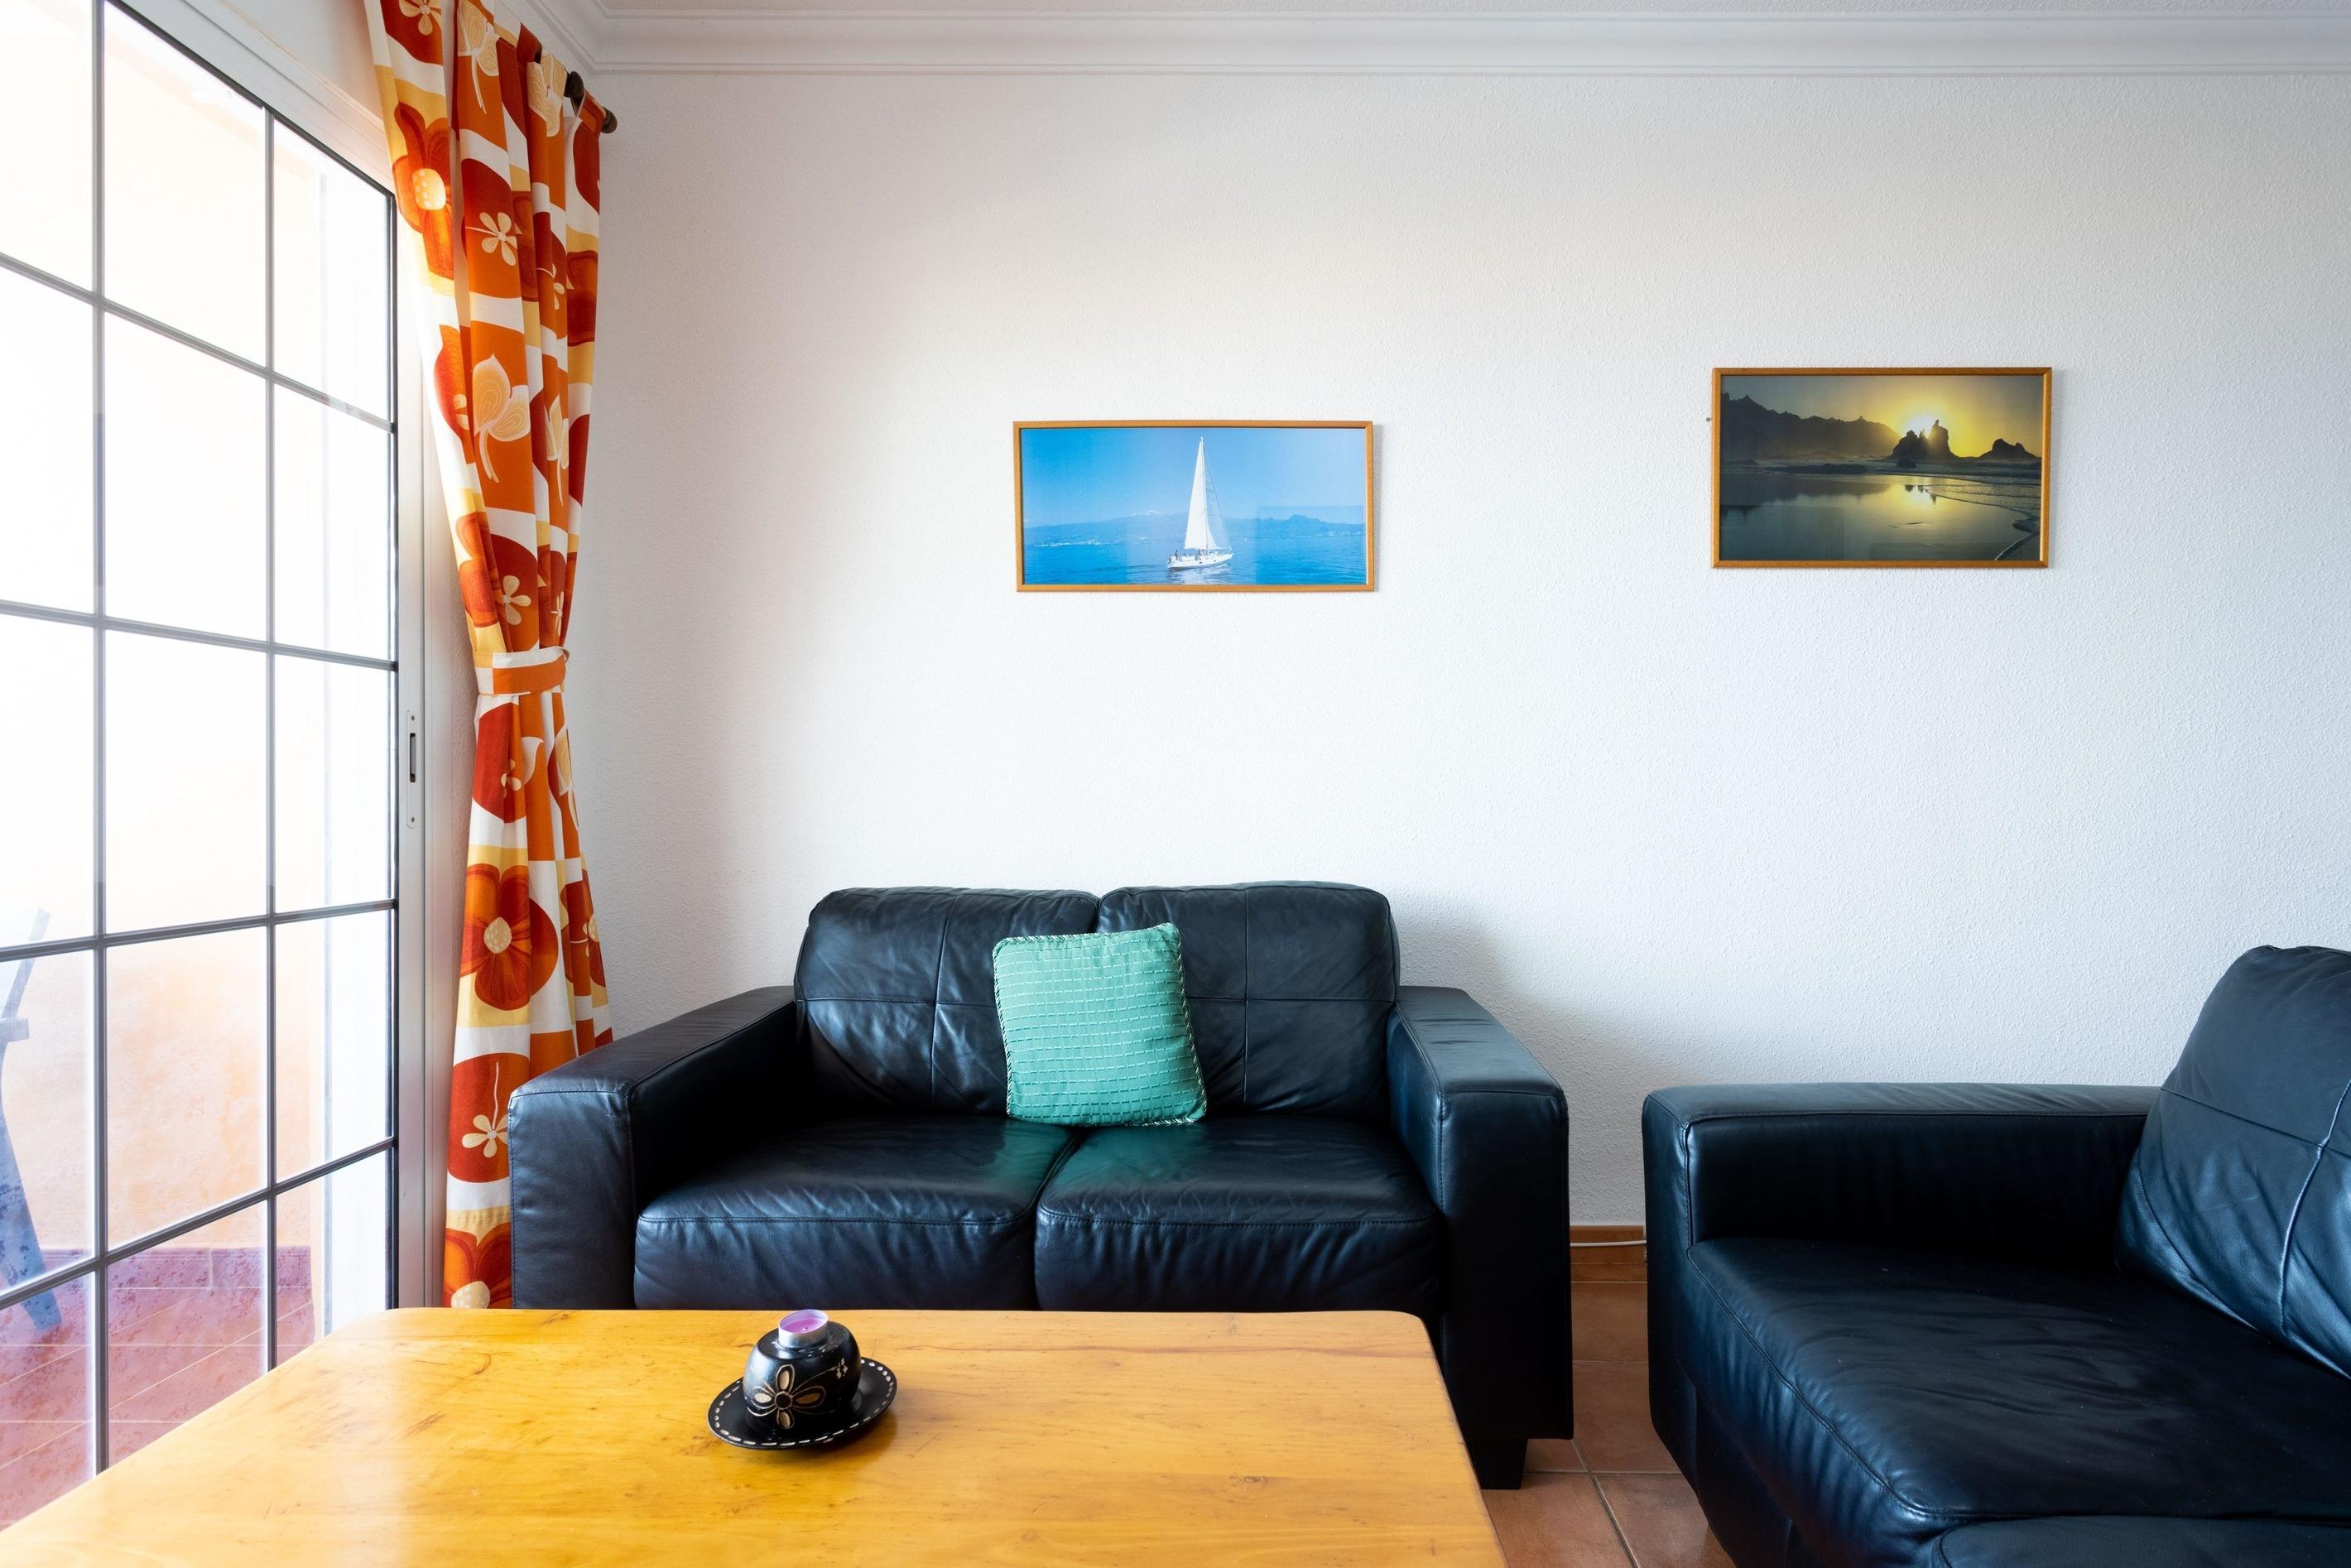 Appartement de vacances Fewo Playamar Romantico, Nähe Strand, toller Meerblick, 2 Schlafzimmer, 2 Terrassen, Pool, (2492988), Puerto de la Cruz, Ténérife, Iles Canaries, Espagne, image 4